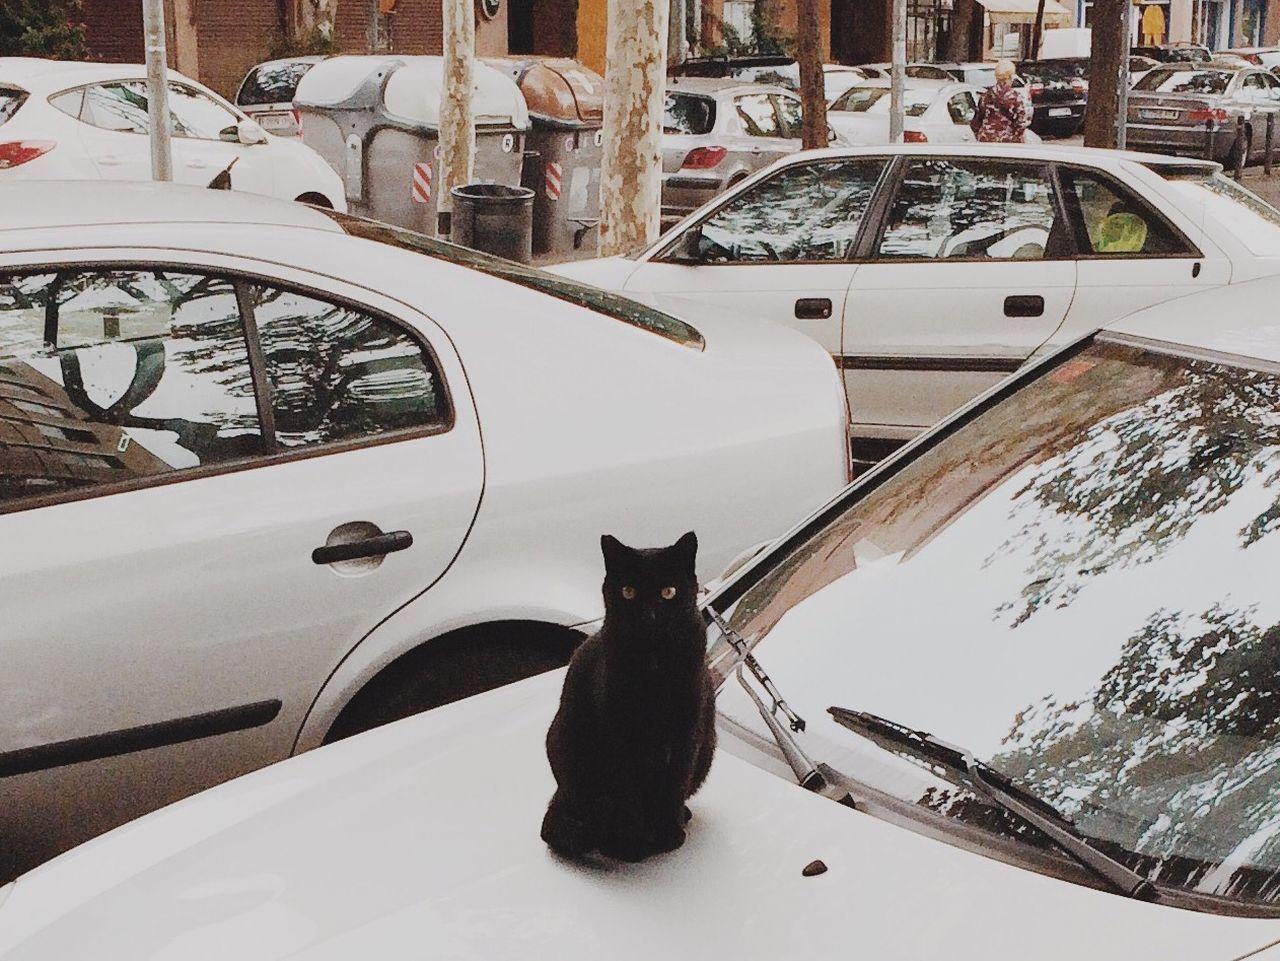 Black cat sitting on car in parking lot